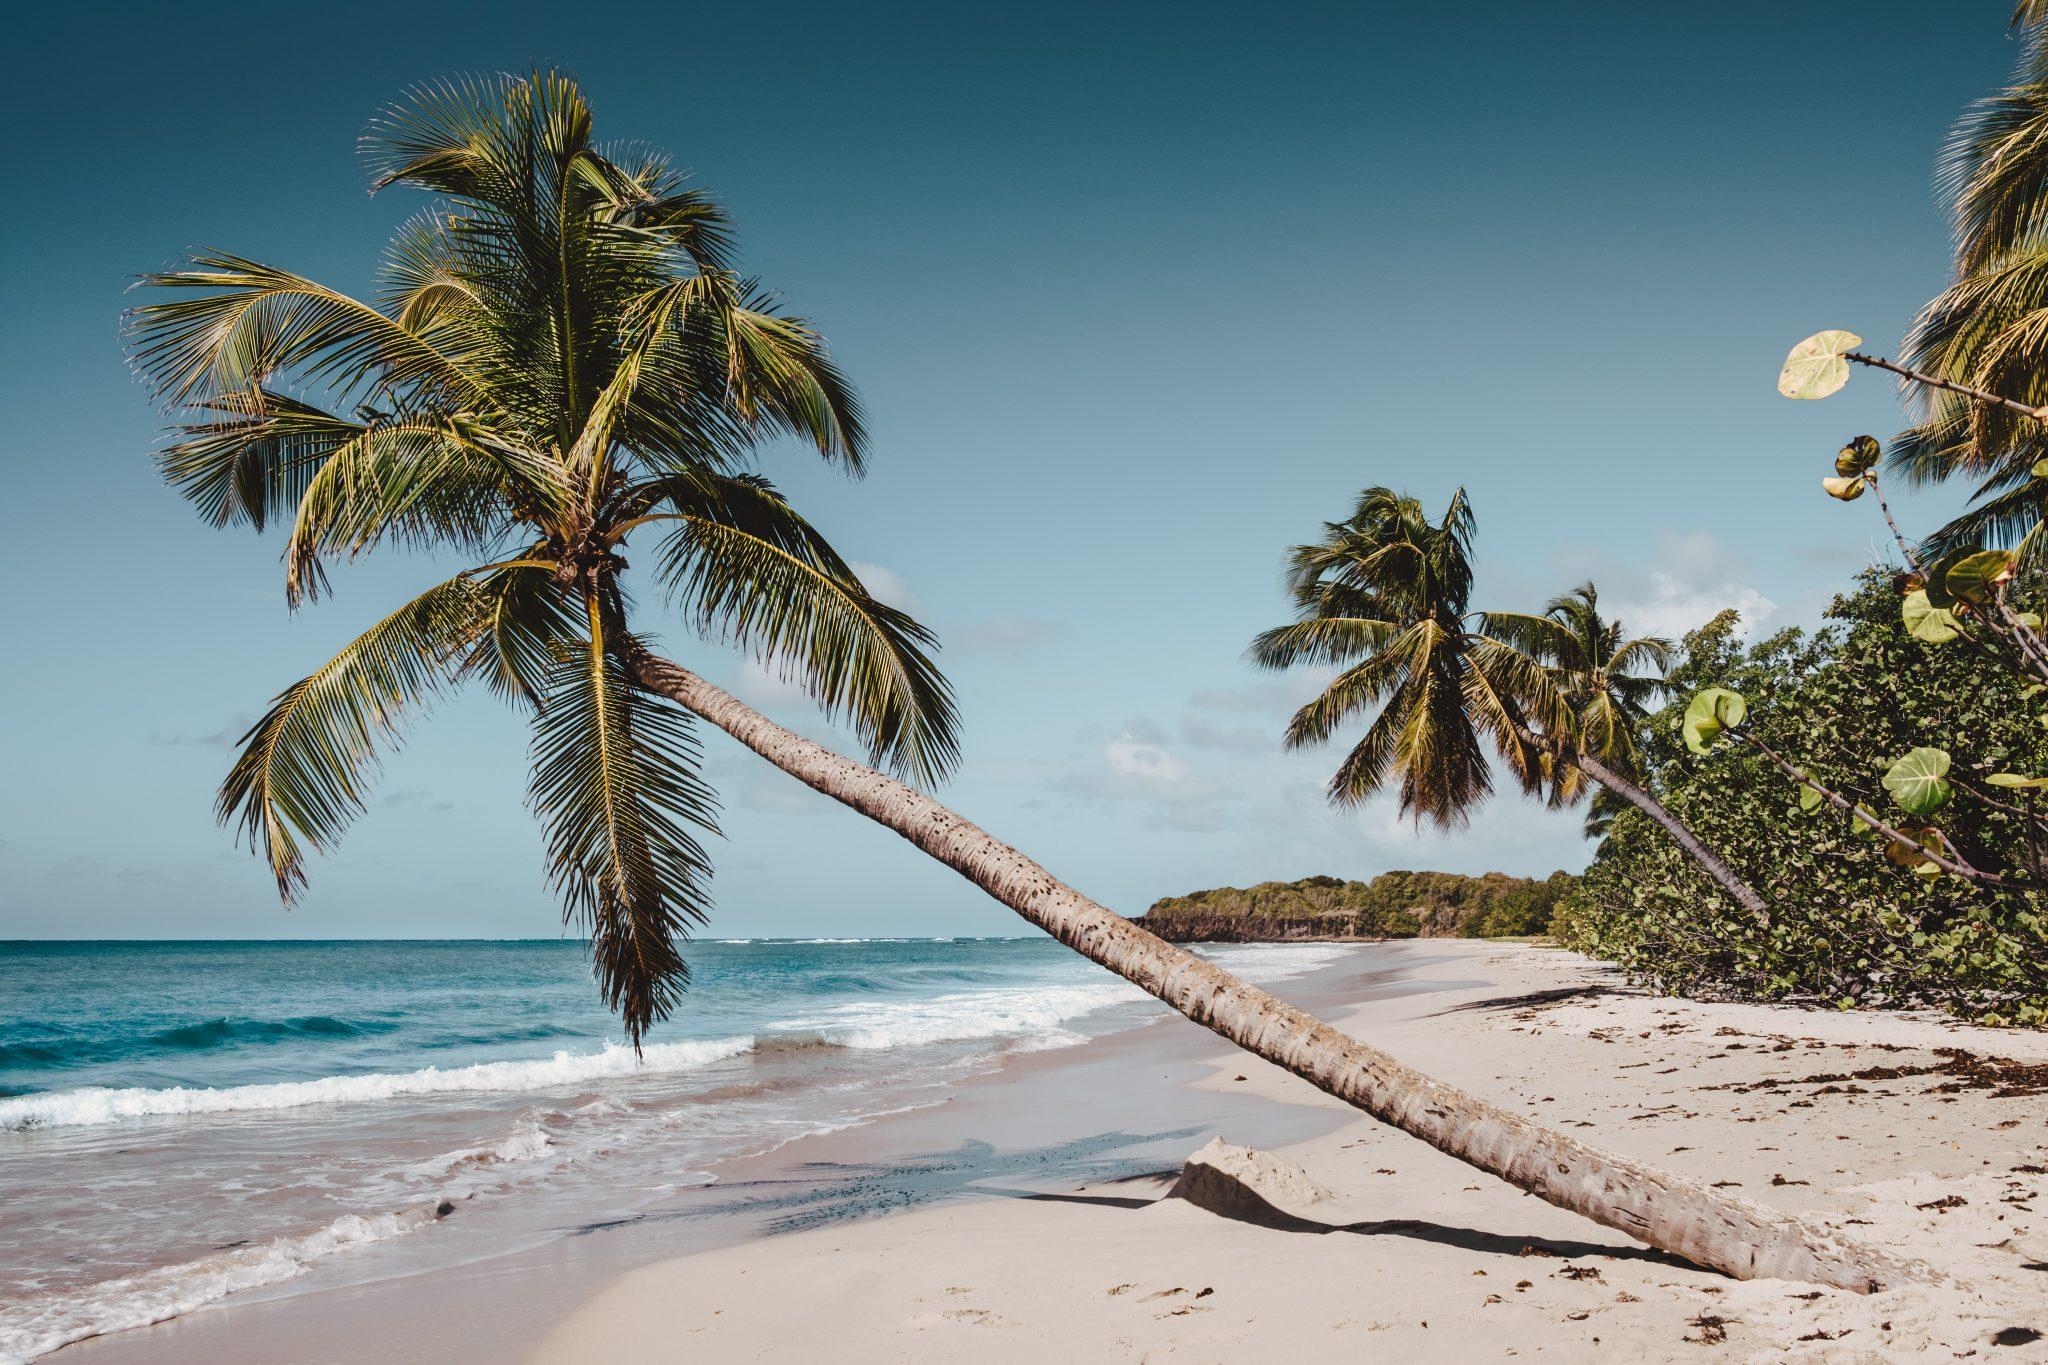 green leaning coconut tree near seashore at daytime